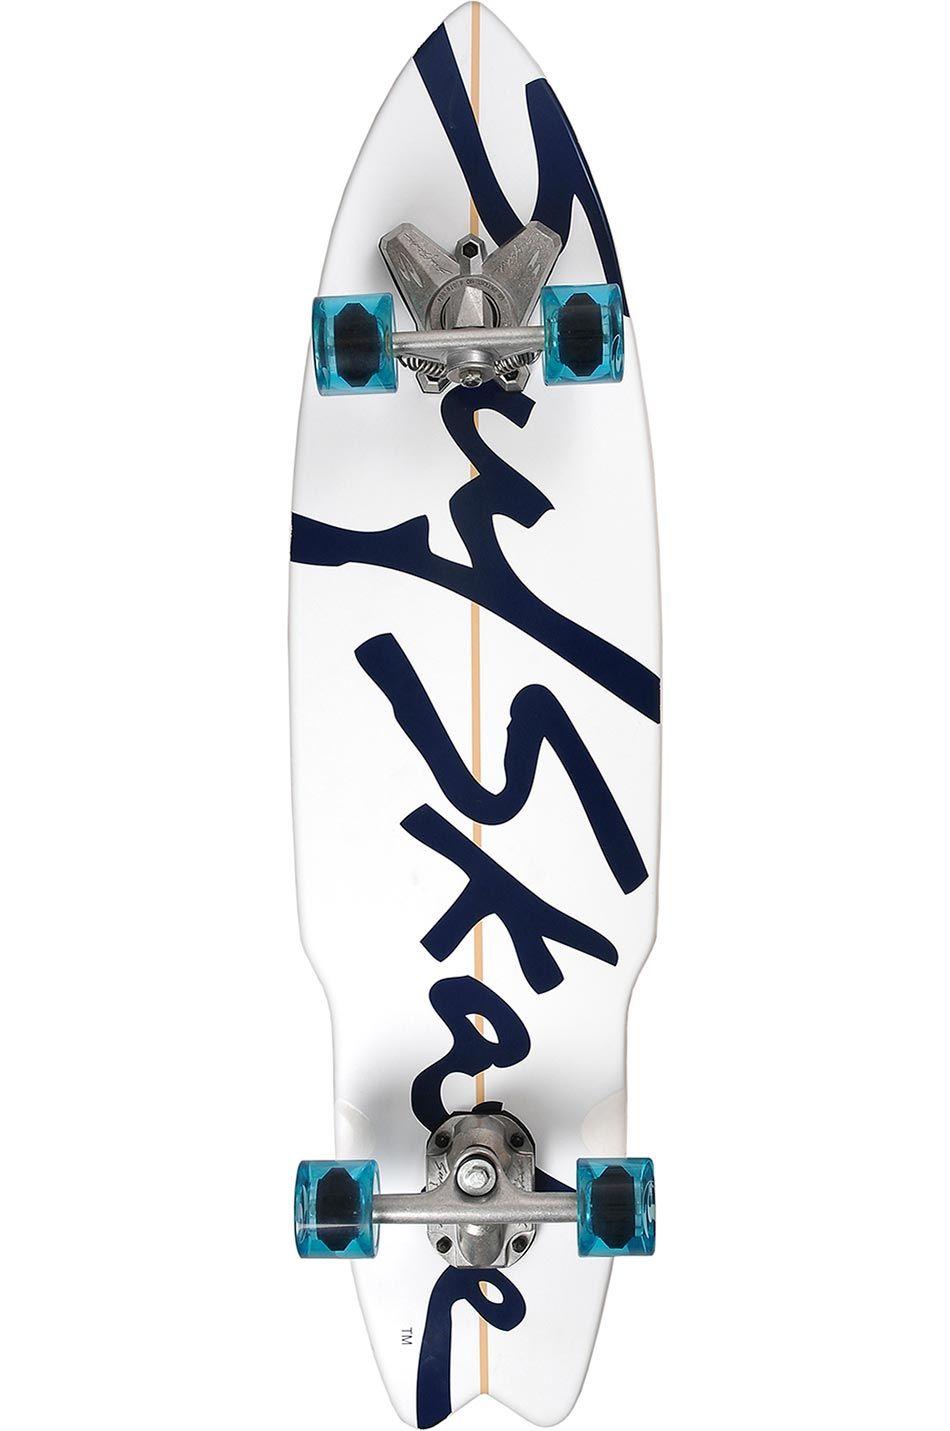 Skate SurfSkate PREMIERE NAVY 40in White/Navy